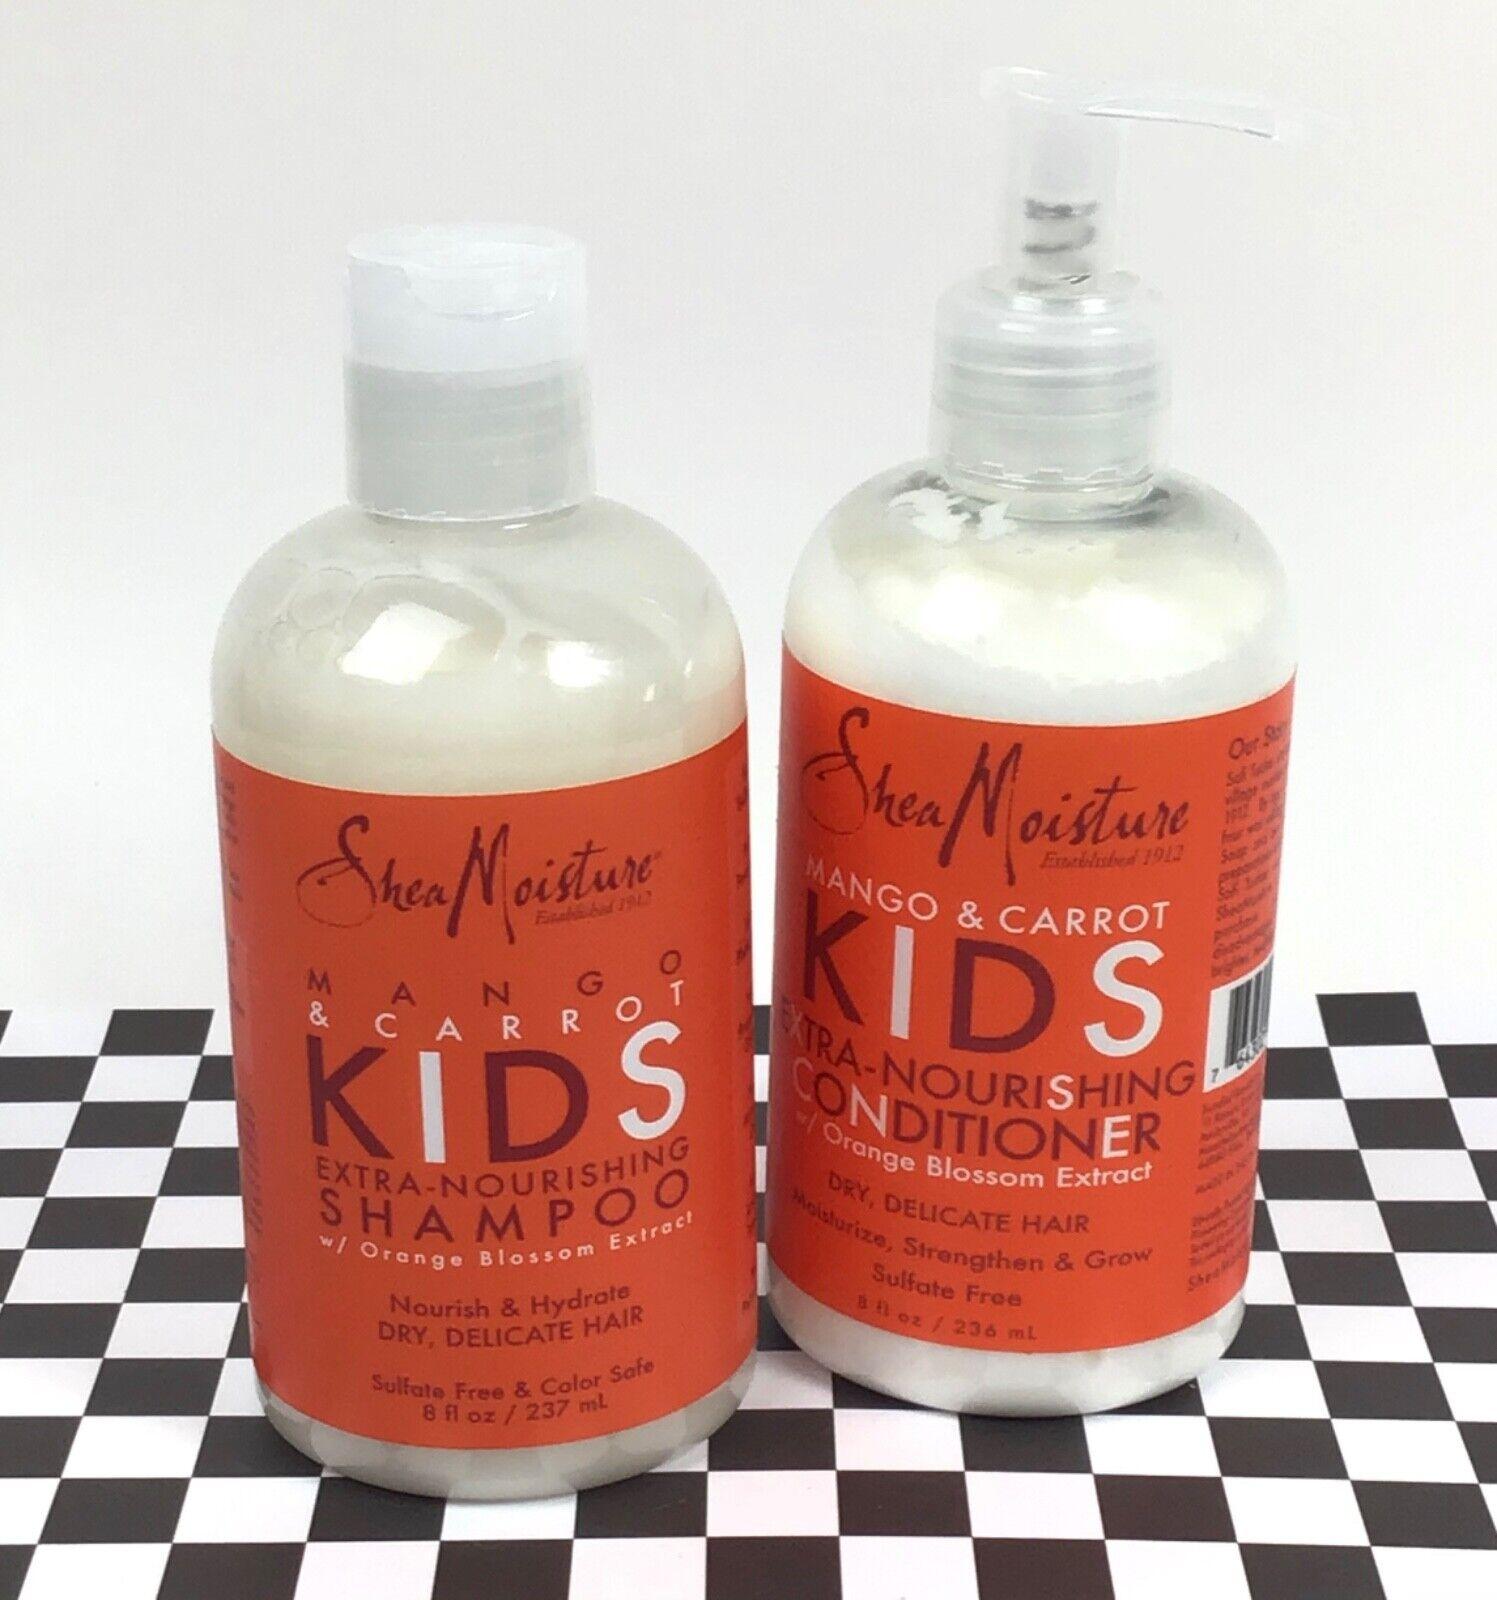 SheaMoisture Mango & Carrot Kids Extra-Nourishing Shampoo, 8